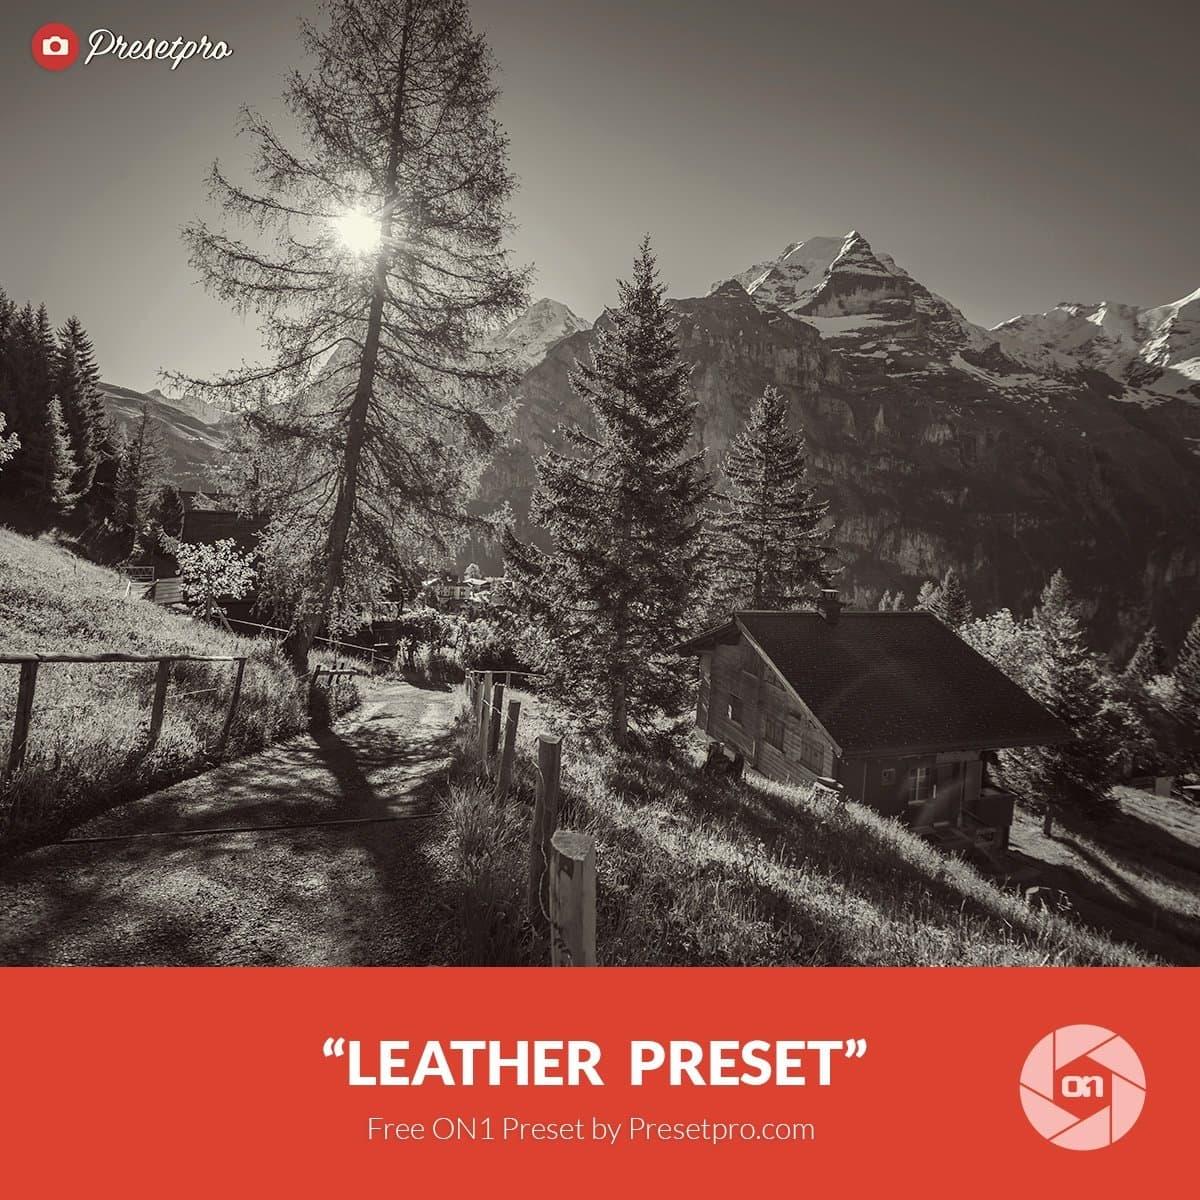 Free-On1-Preset-Leather-Presetpro.com